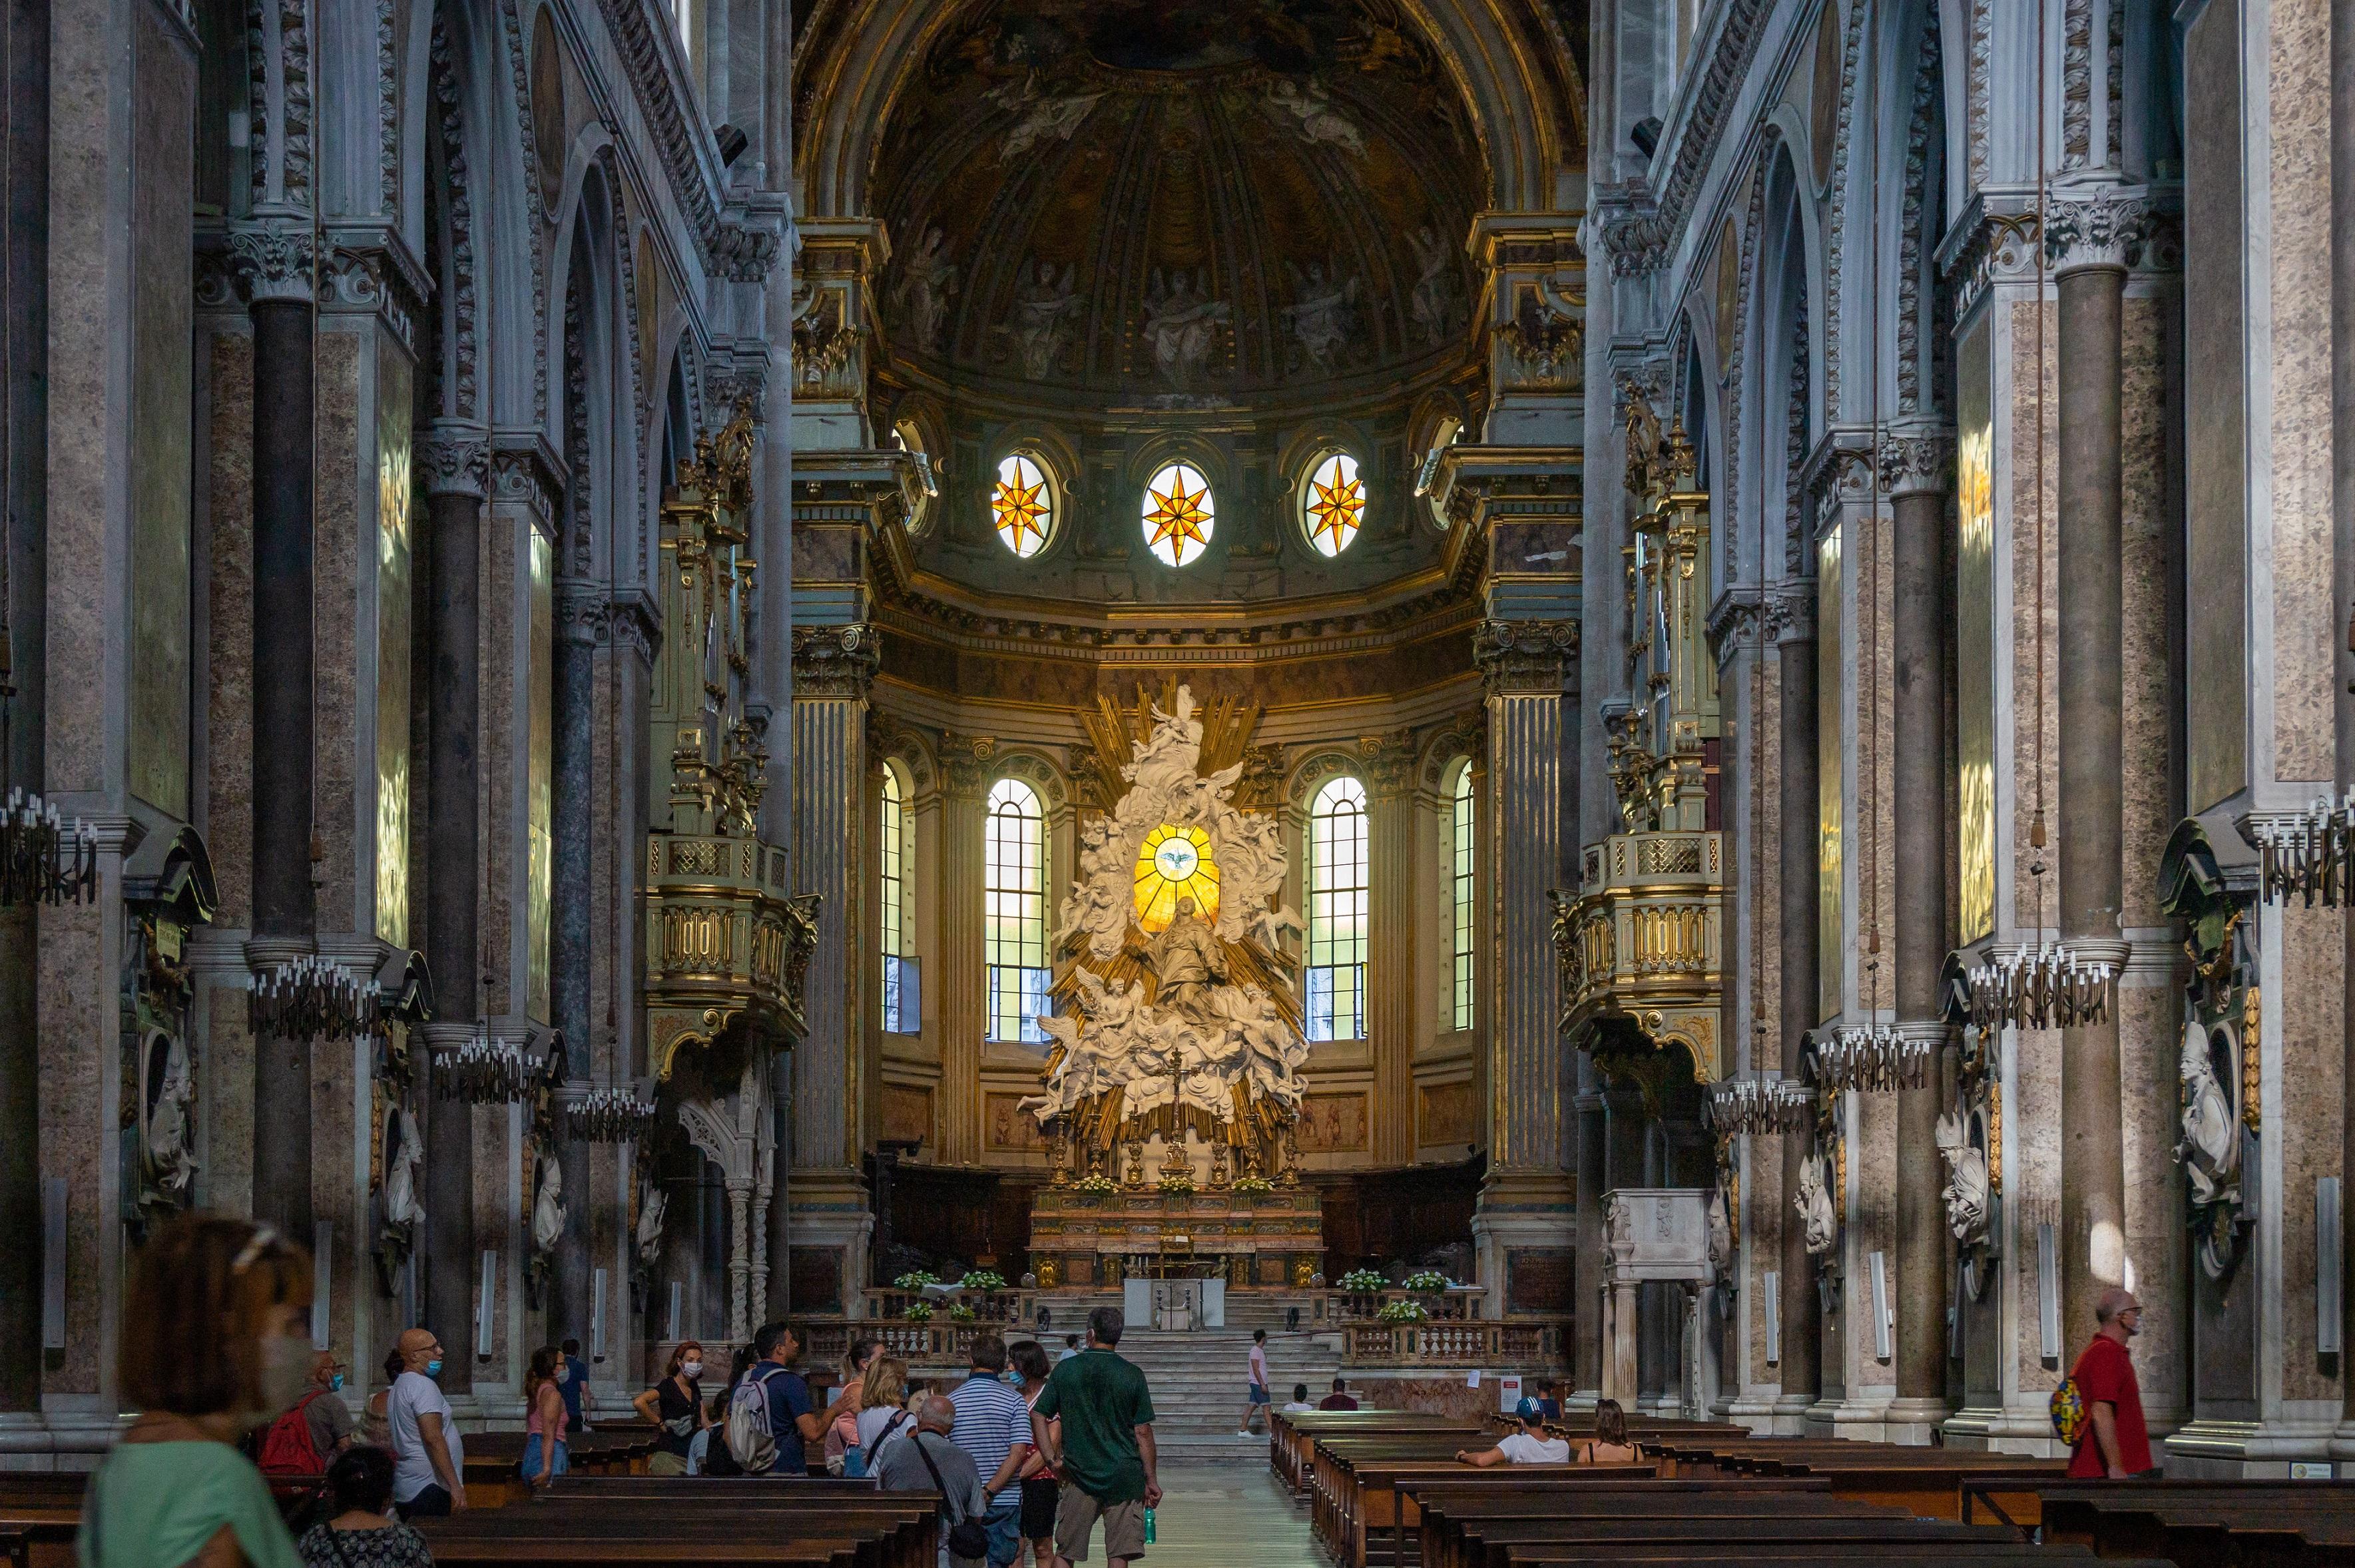 Naples_Cathedral_-_Duomo_di_Napoli,_Central_nave